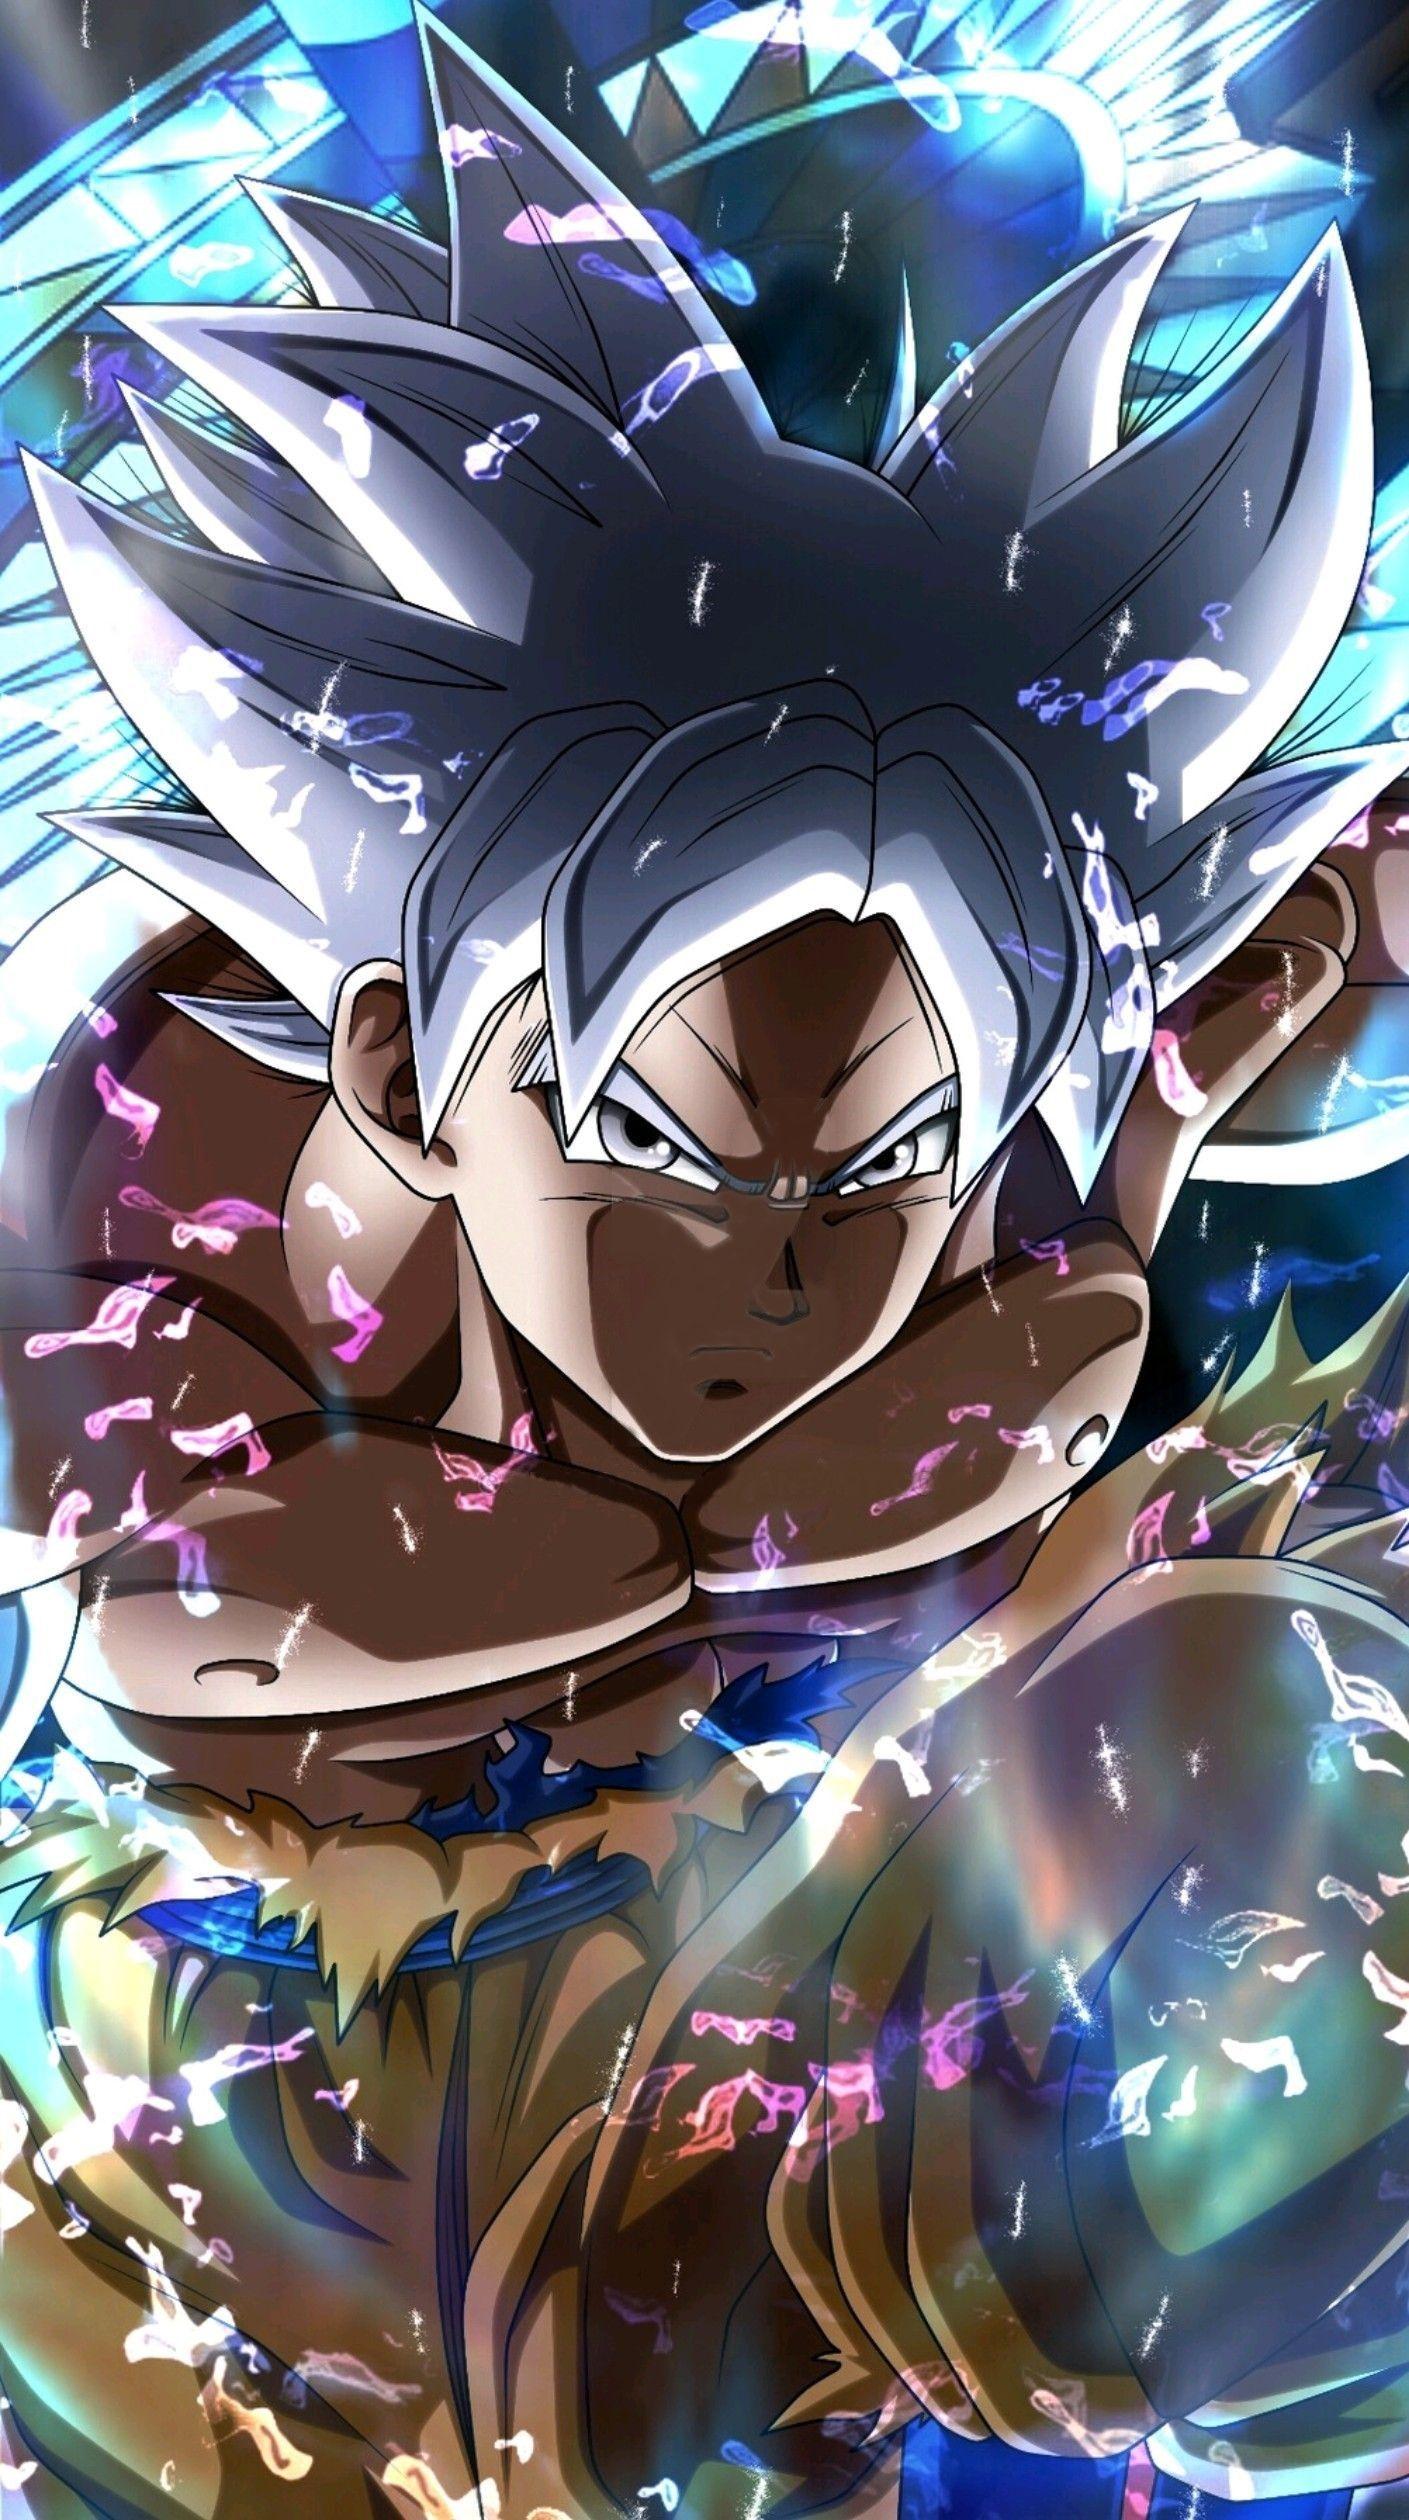 Goku ultra instinto dominado dragon ball dibujo de goku fondos de pantalla goku y pantalla - Imagenes de dragon ball super ultra instinto ...